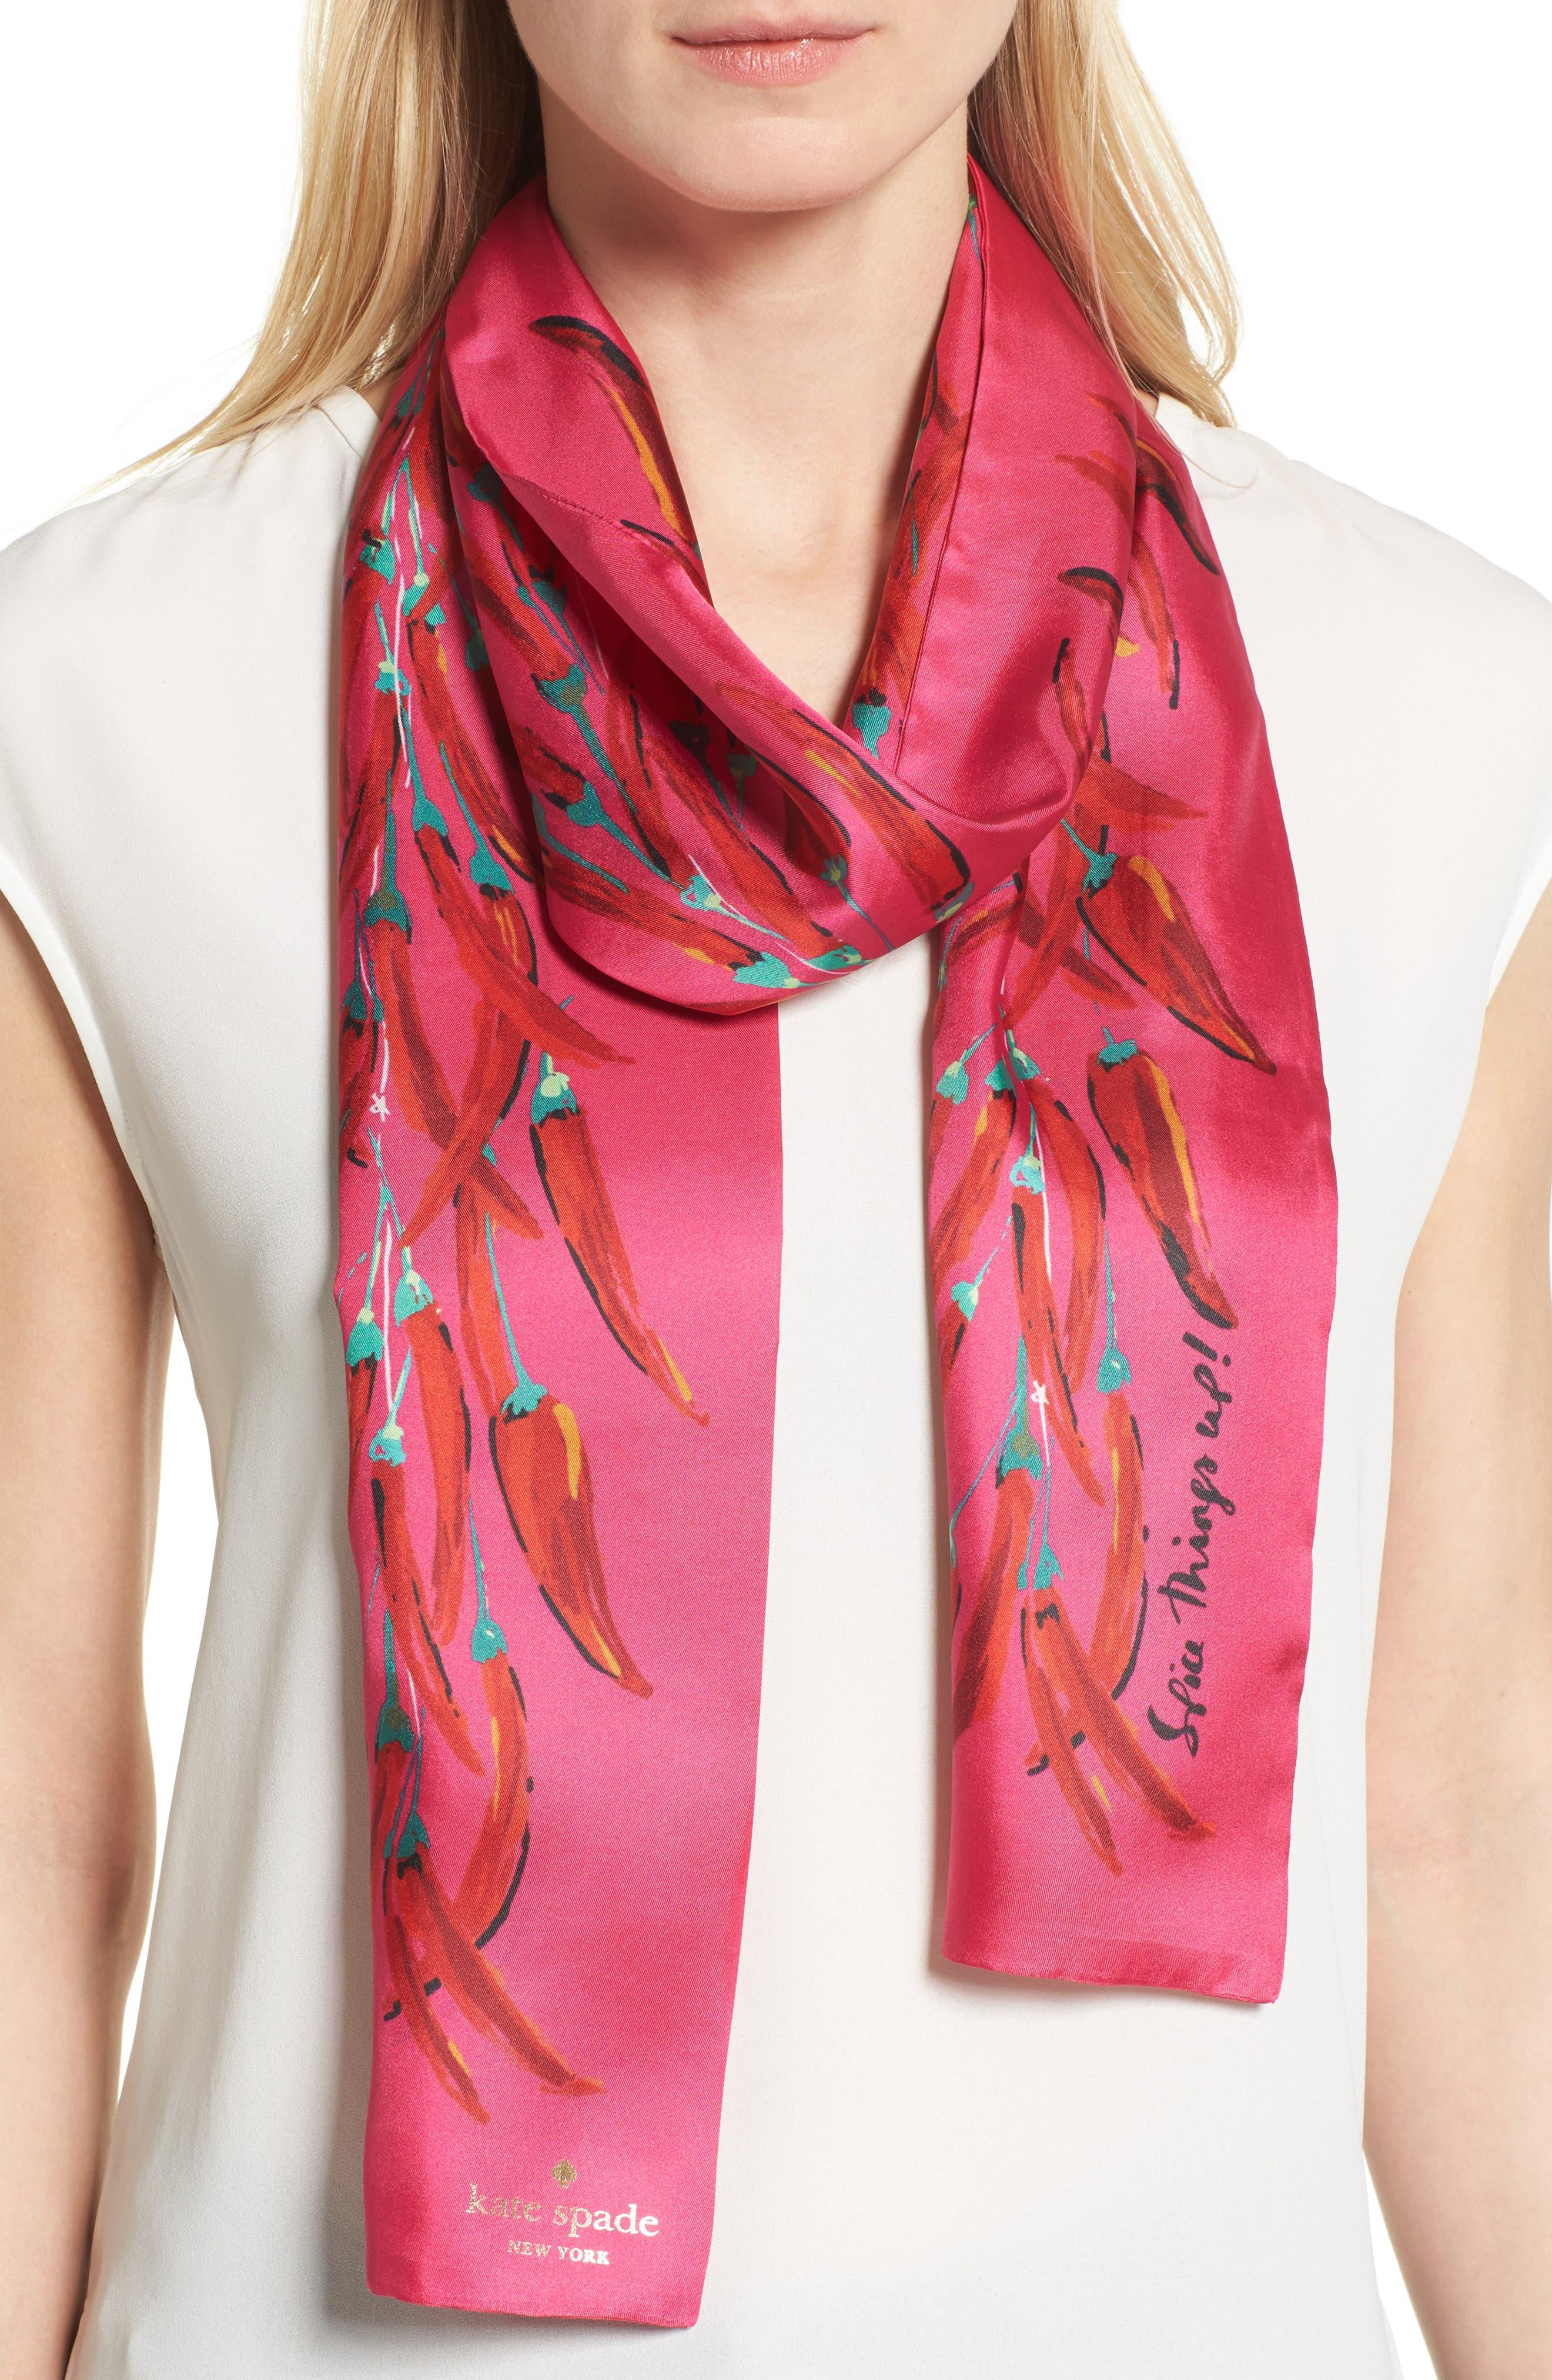 kate spade new york chili pepper string skinny scarf